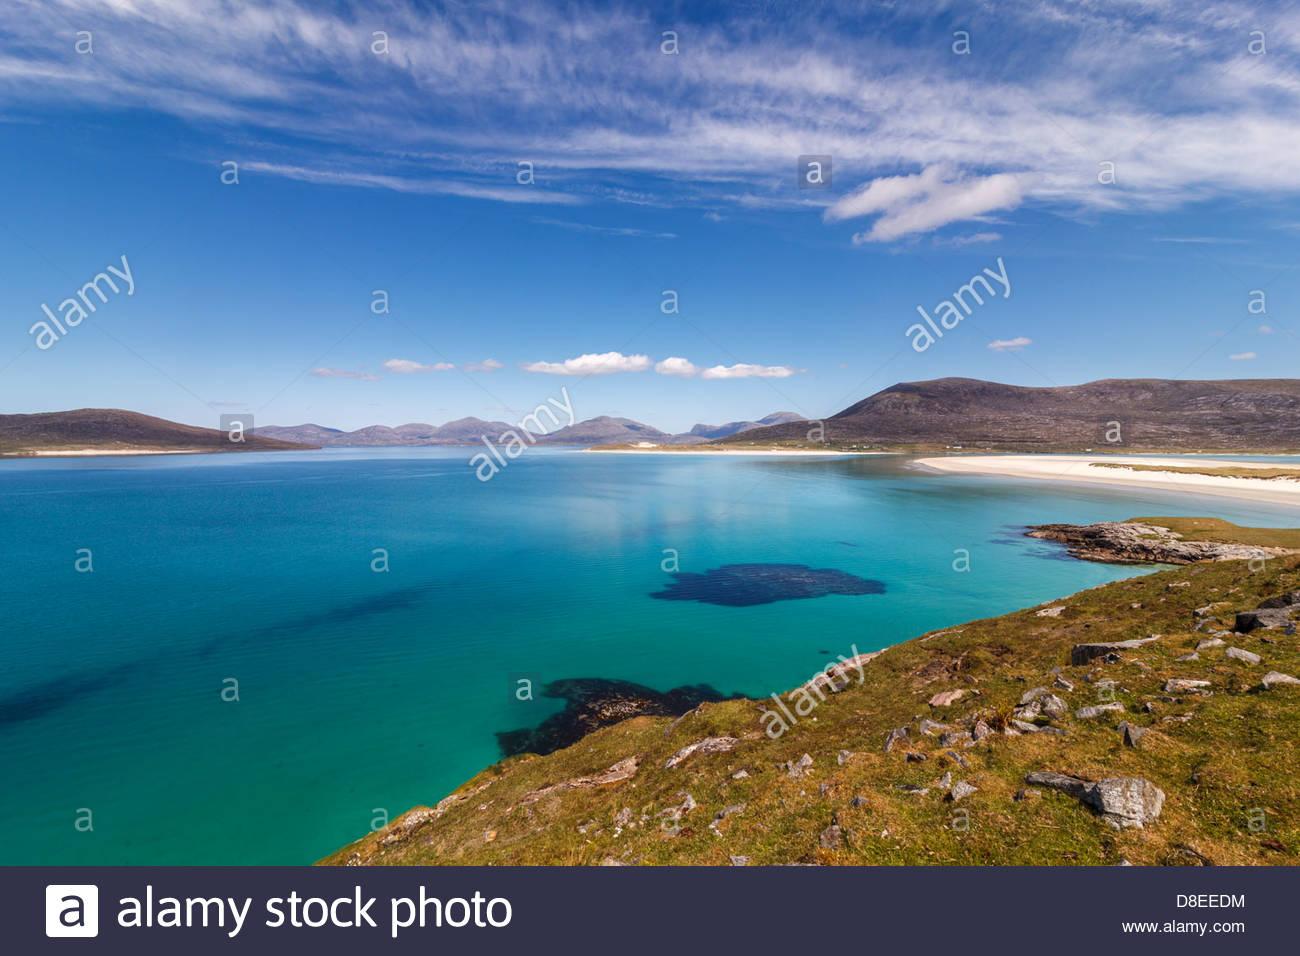 View from Horgabost towards Taransay (Tarasaigh) and Luskentyre (Lusgaintir), Isle of Harris, Outer Hebrides, Scotland - Stock Image